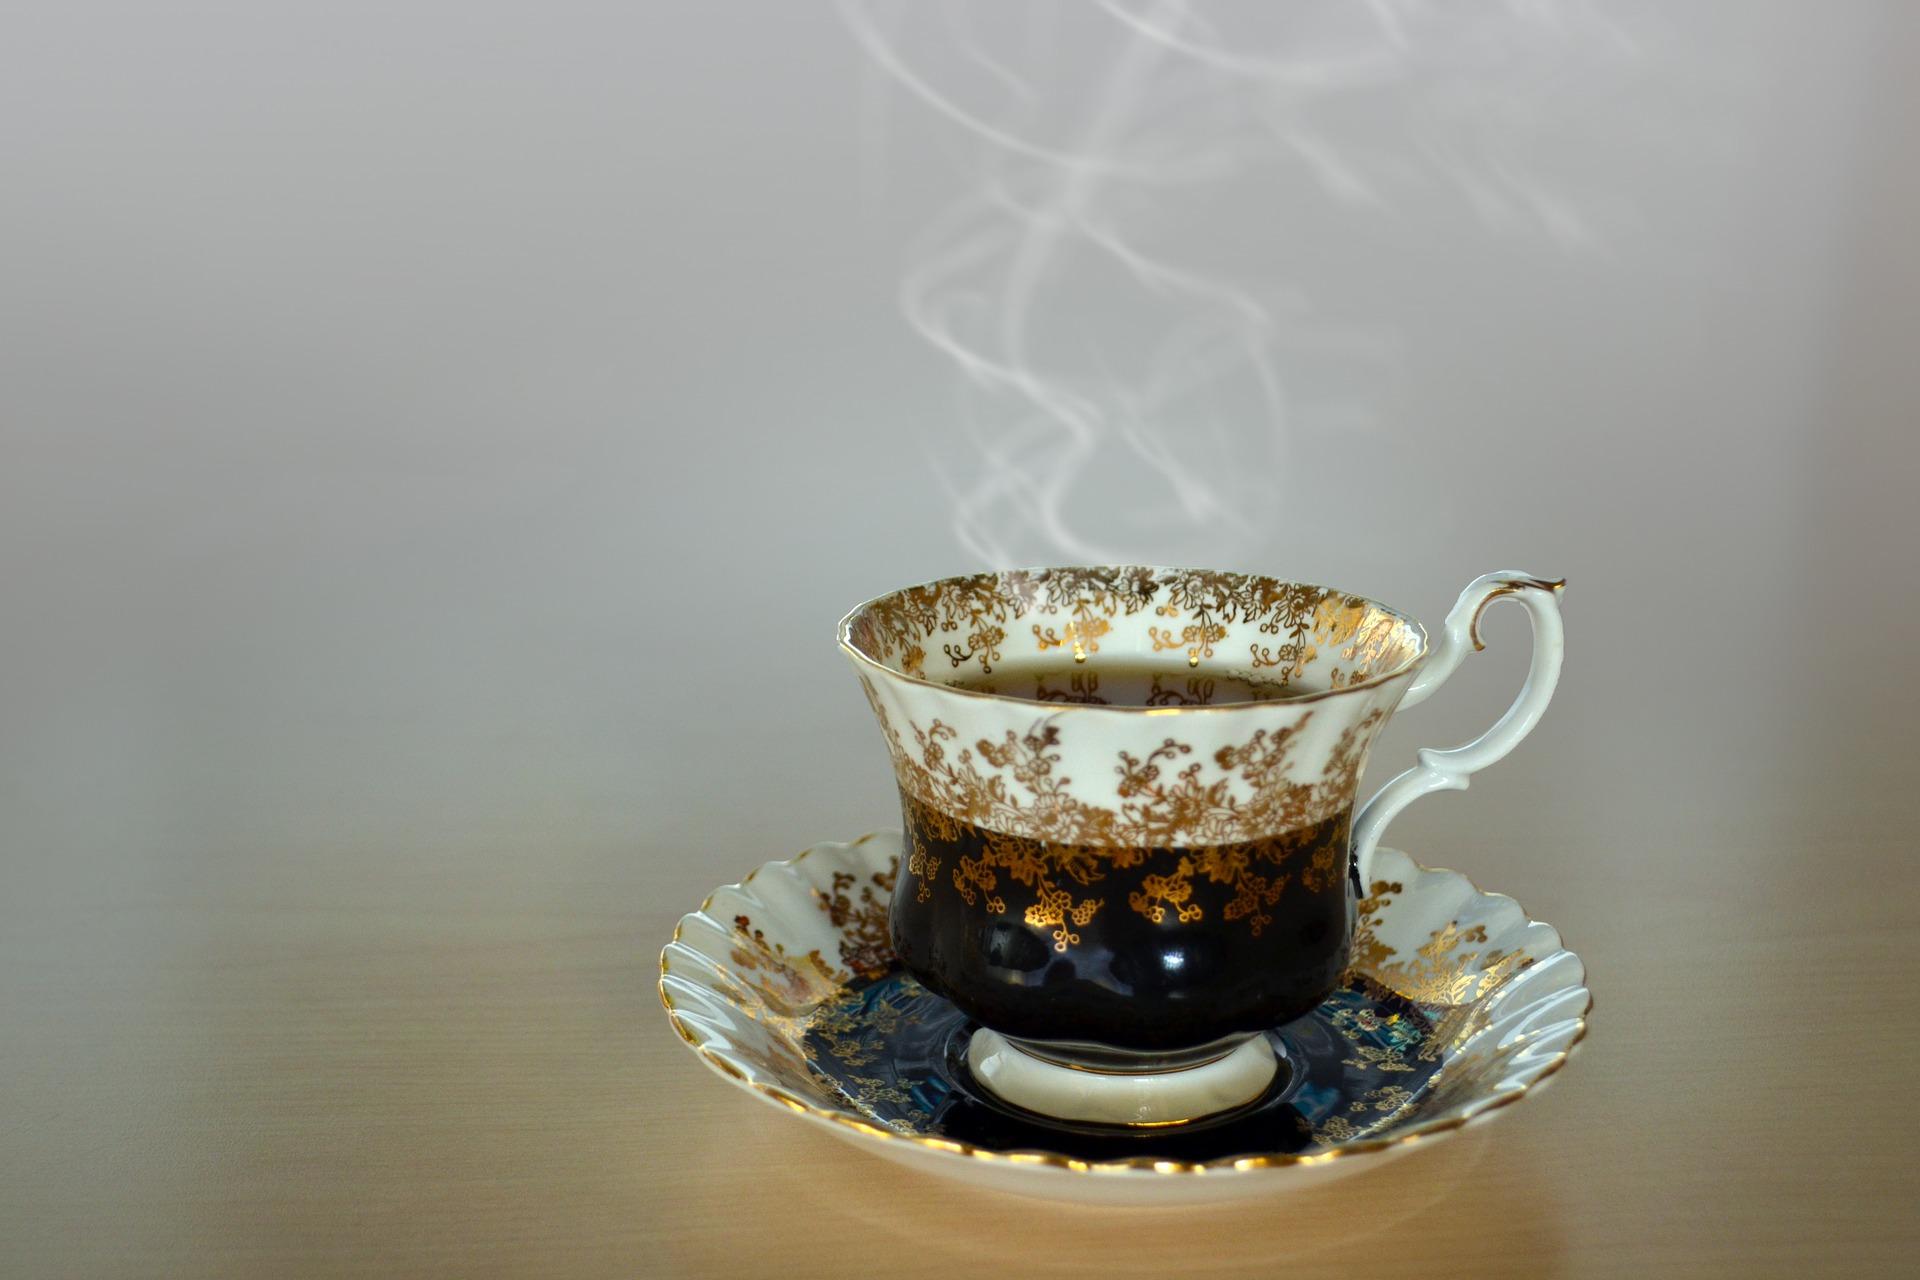 tea-1170551_1920